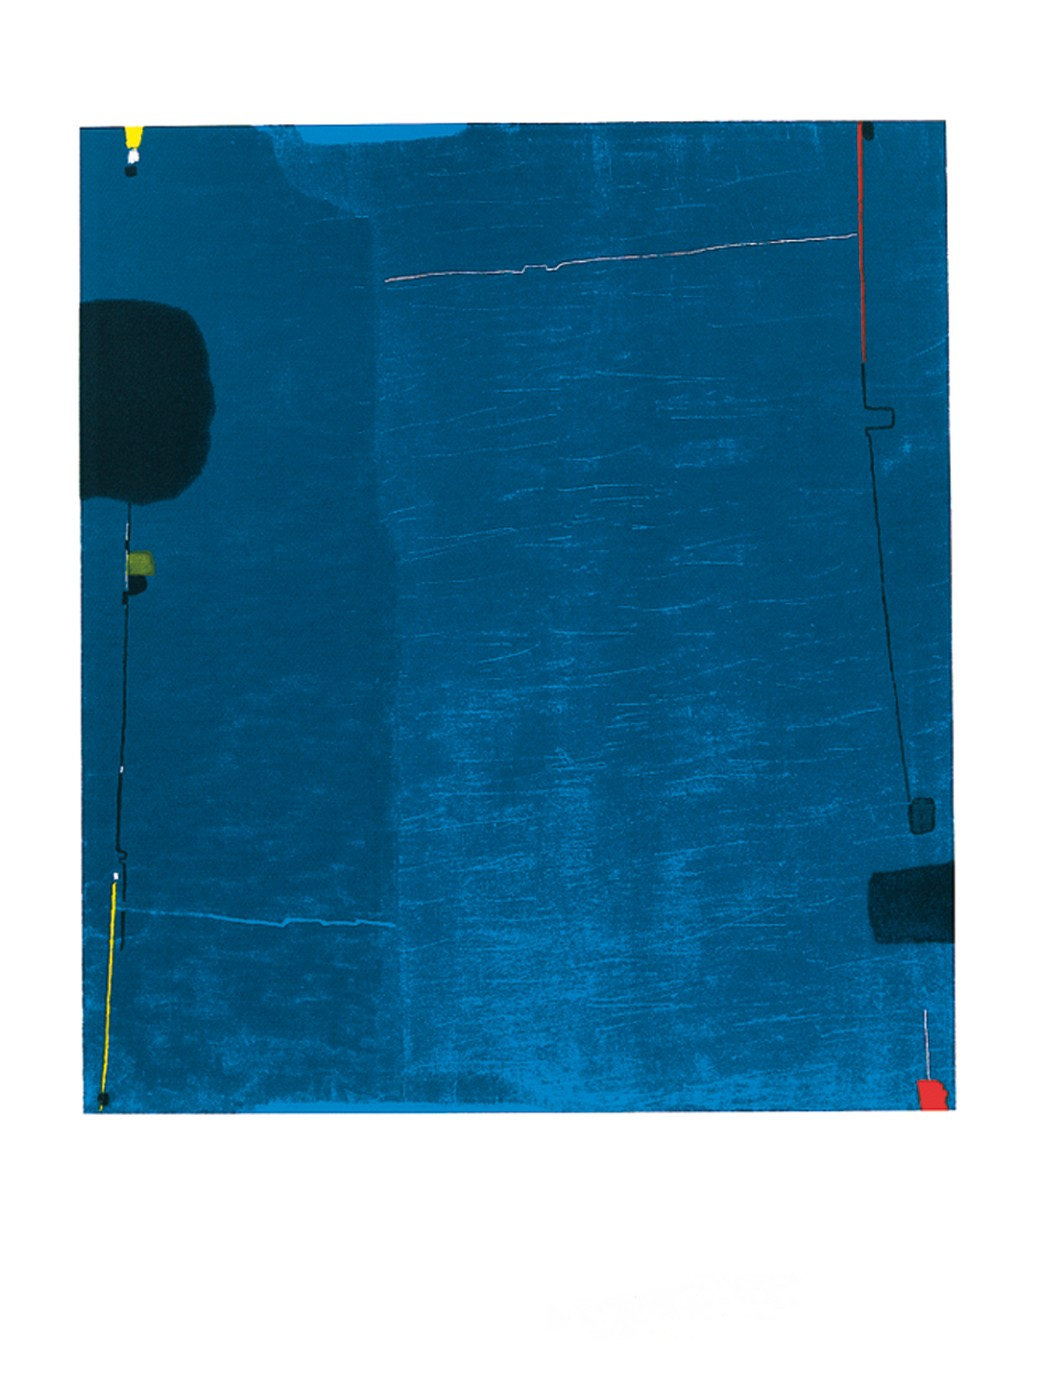 Diptychon blau, 1963